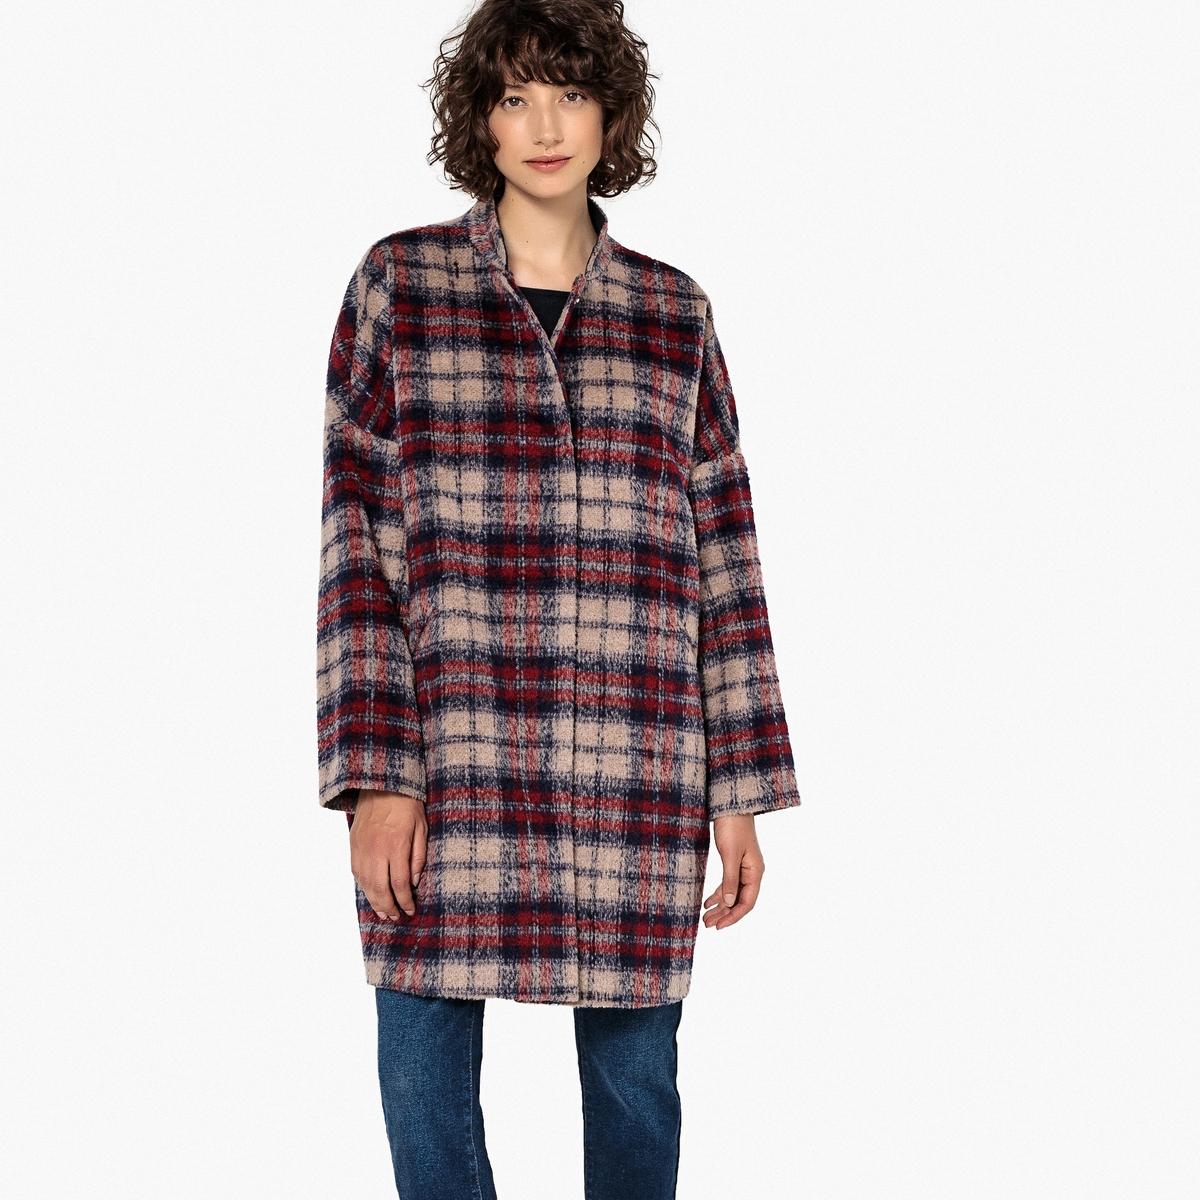 Abrigo con corte amplio de lana mezclada